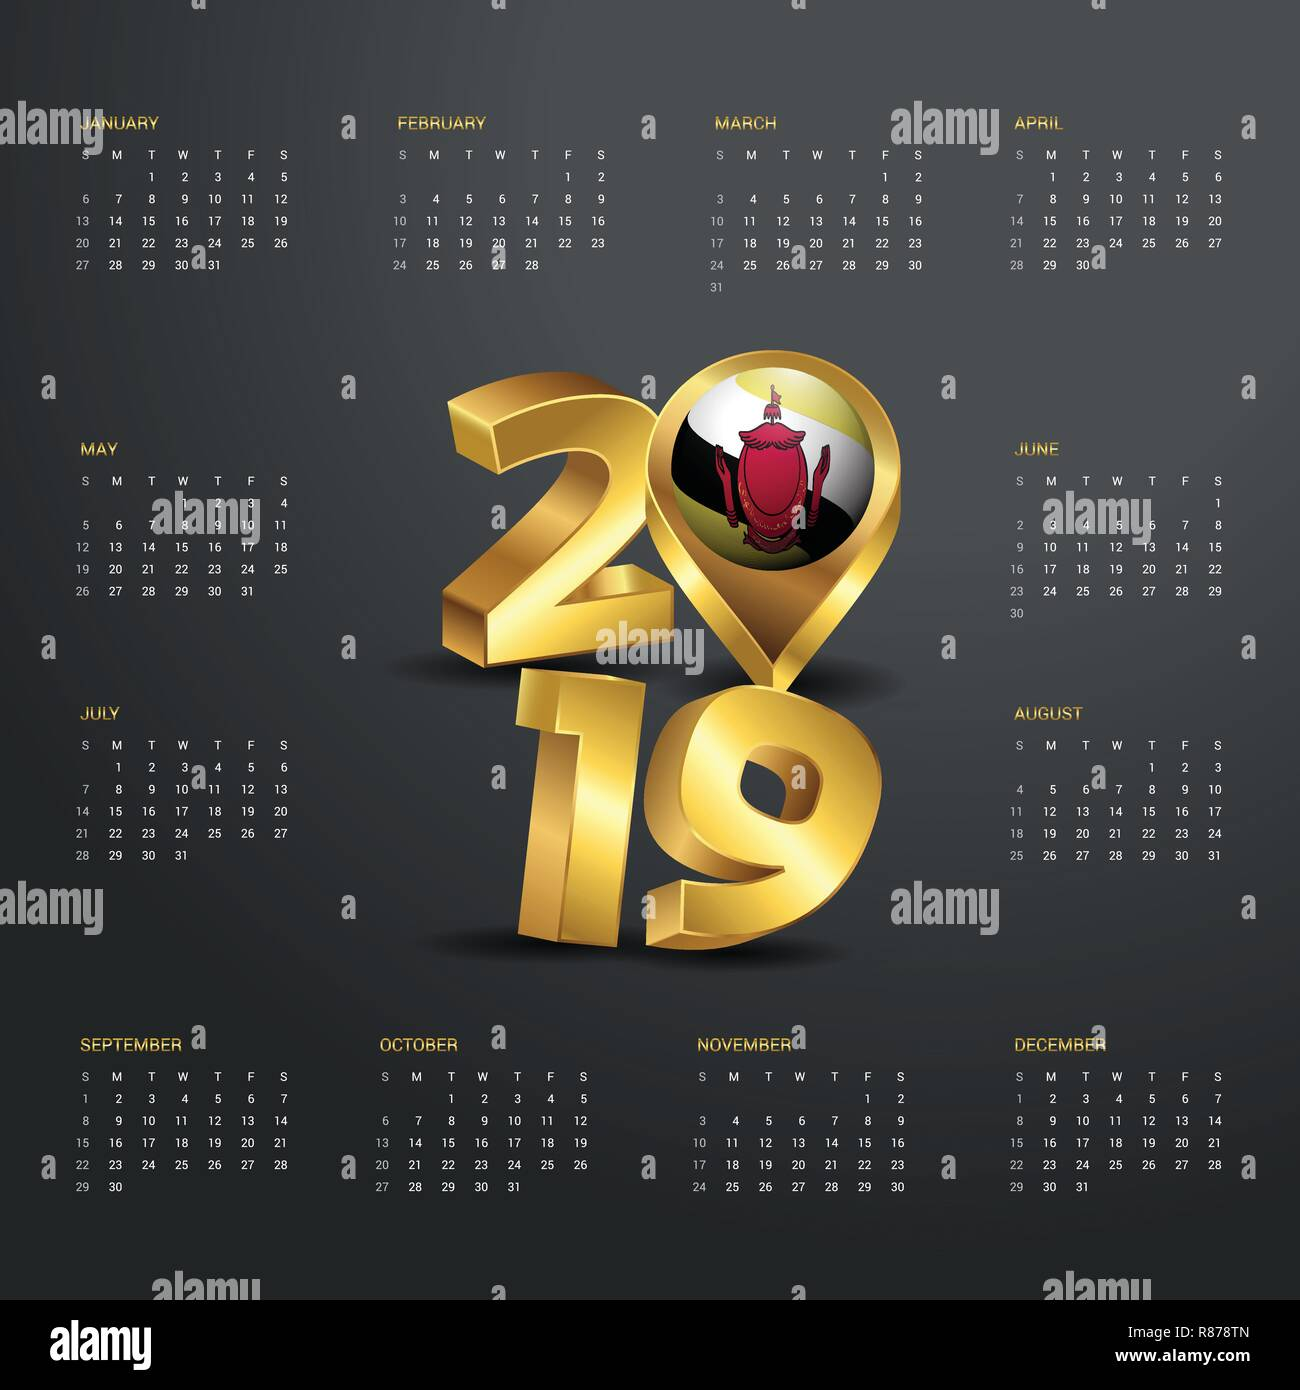 2019 Calendar Template  Golden Typography with Brunei